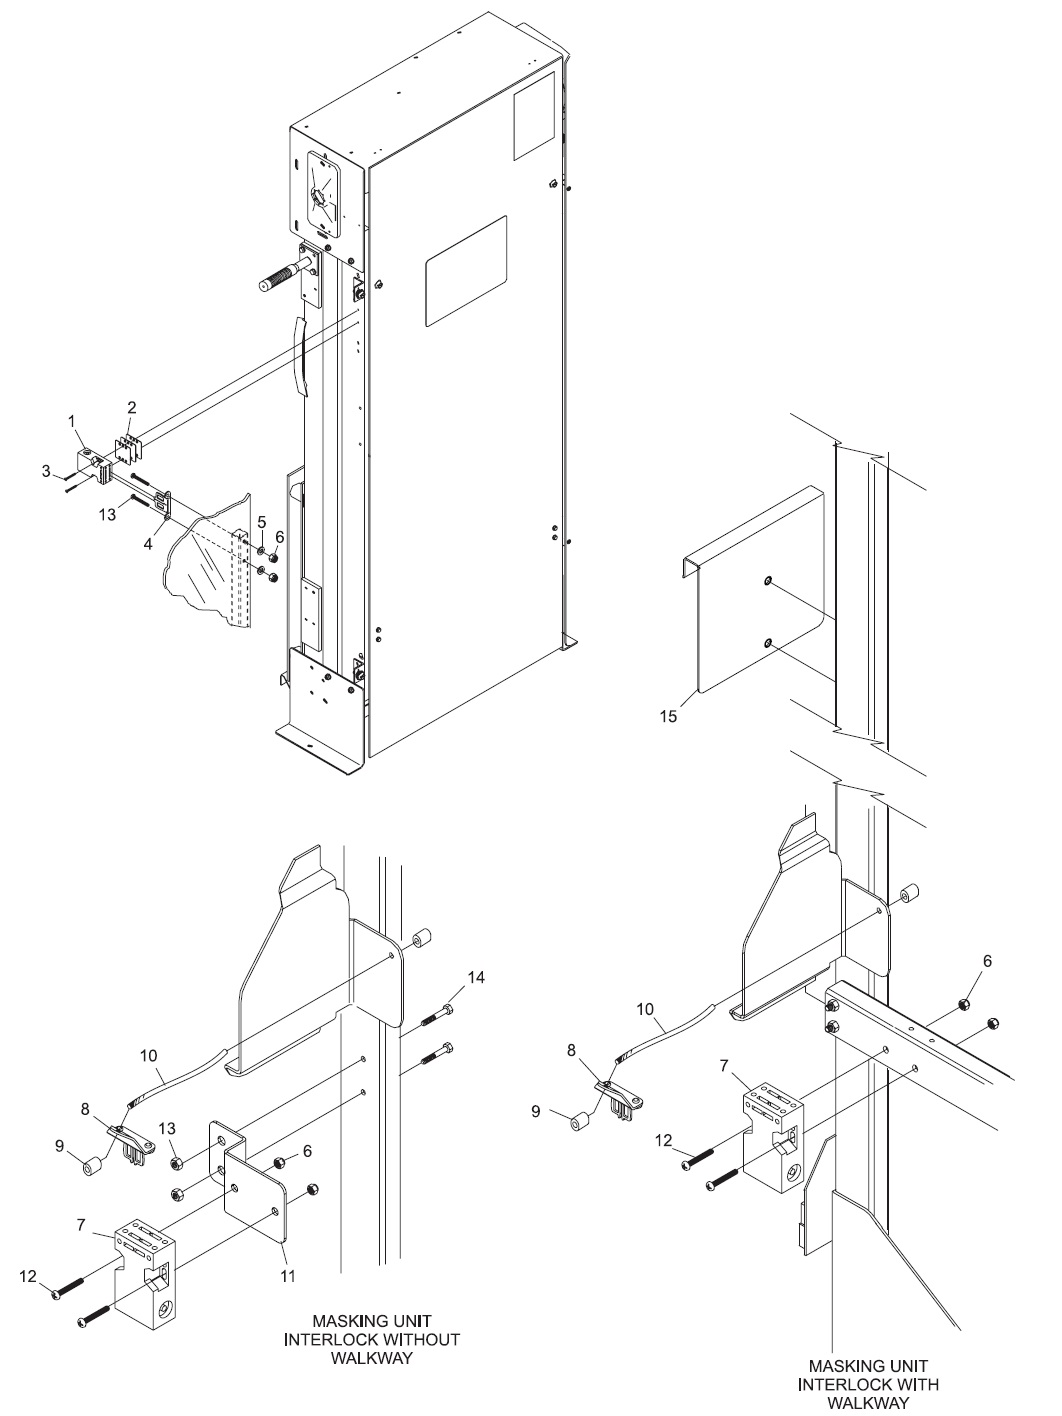 UK Advanced/Advanced Interlocks